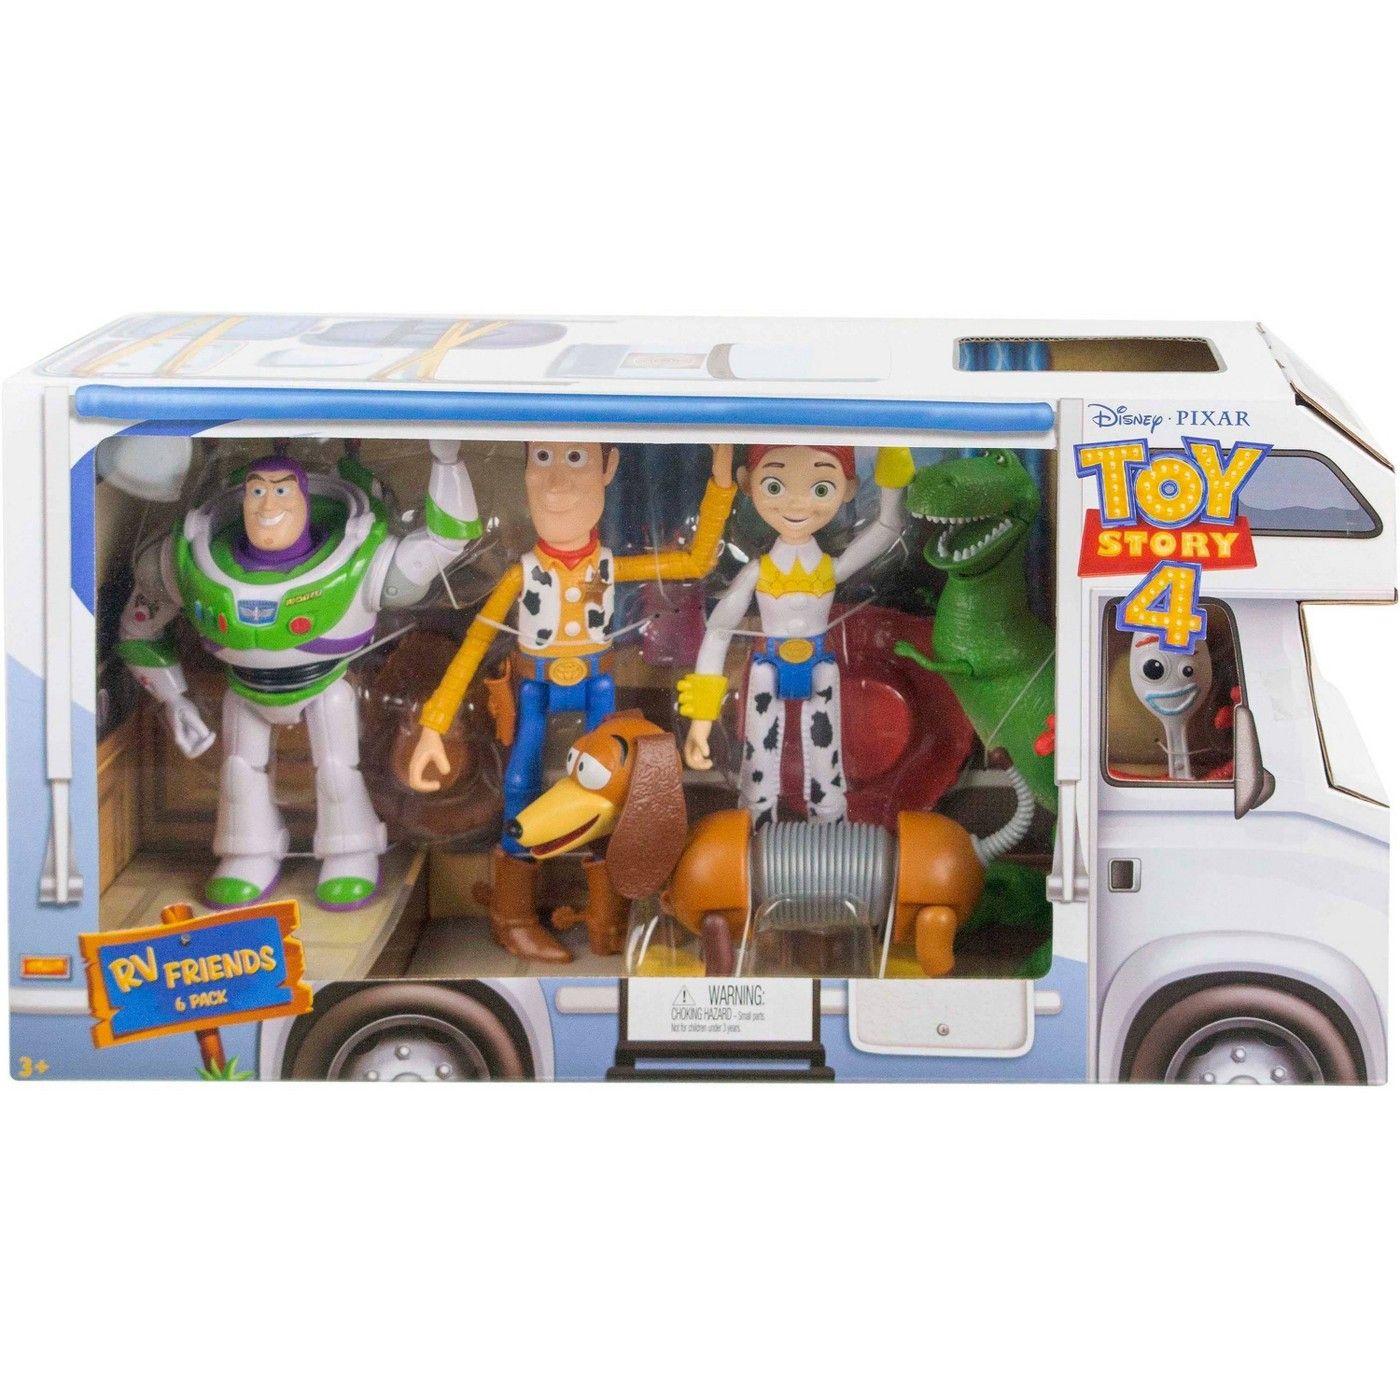 Disney Pixar Toy Story Rv Friends 6pk Figures Disney Pixar Pixar Toys Toy Story